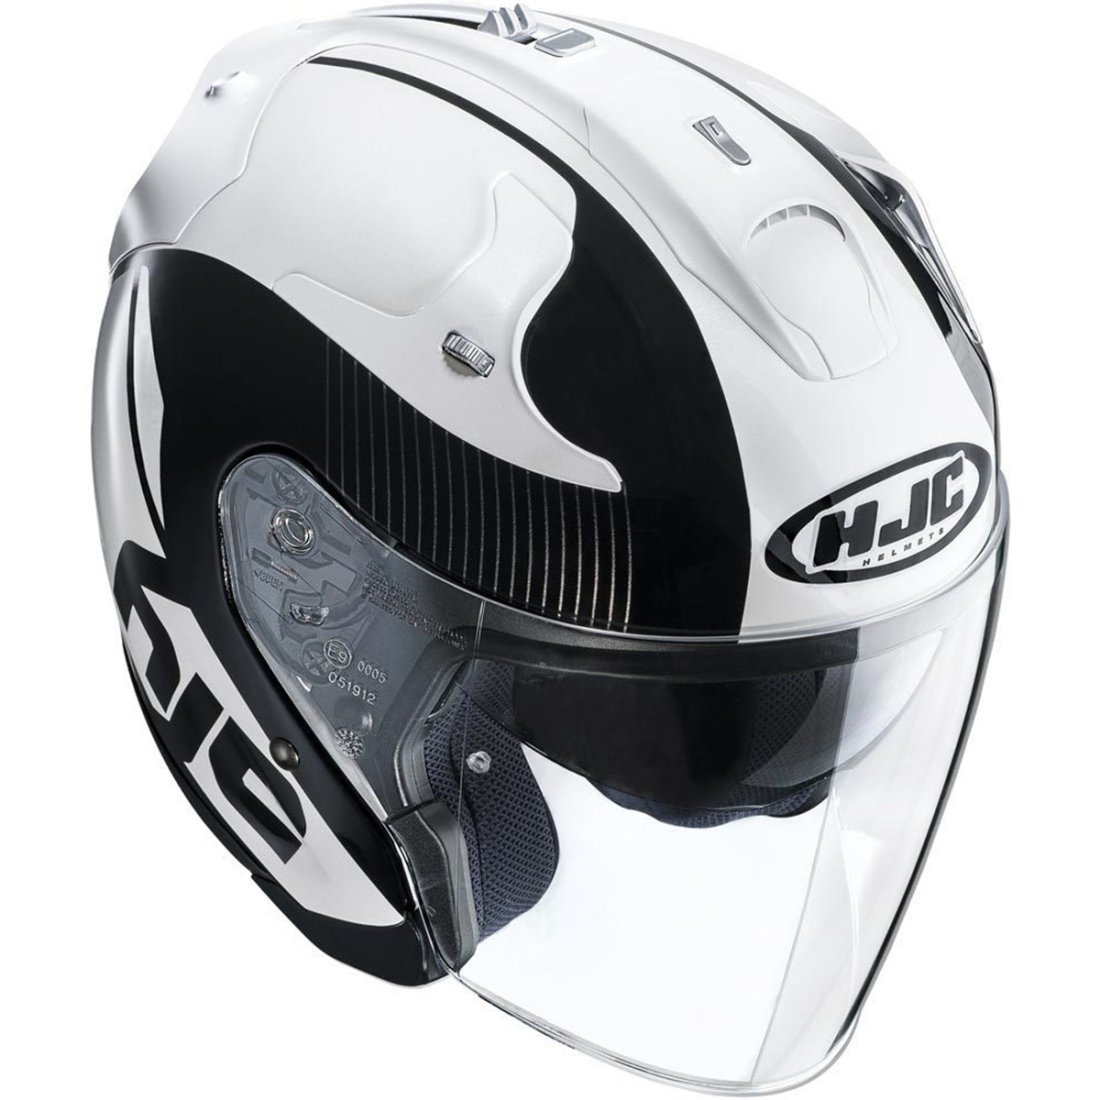 hjc fg jet acadia mc5 helmet motocard. Black Bedroom Furniture Sets. Home Design Ideas